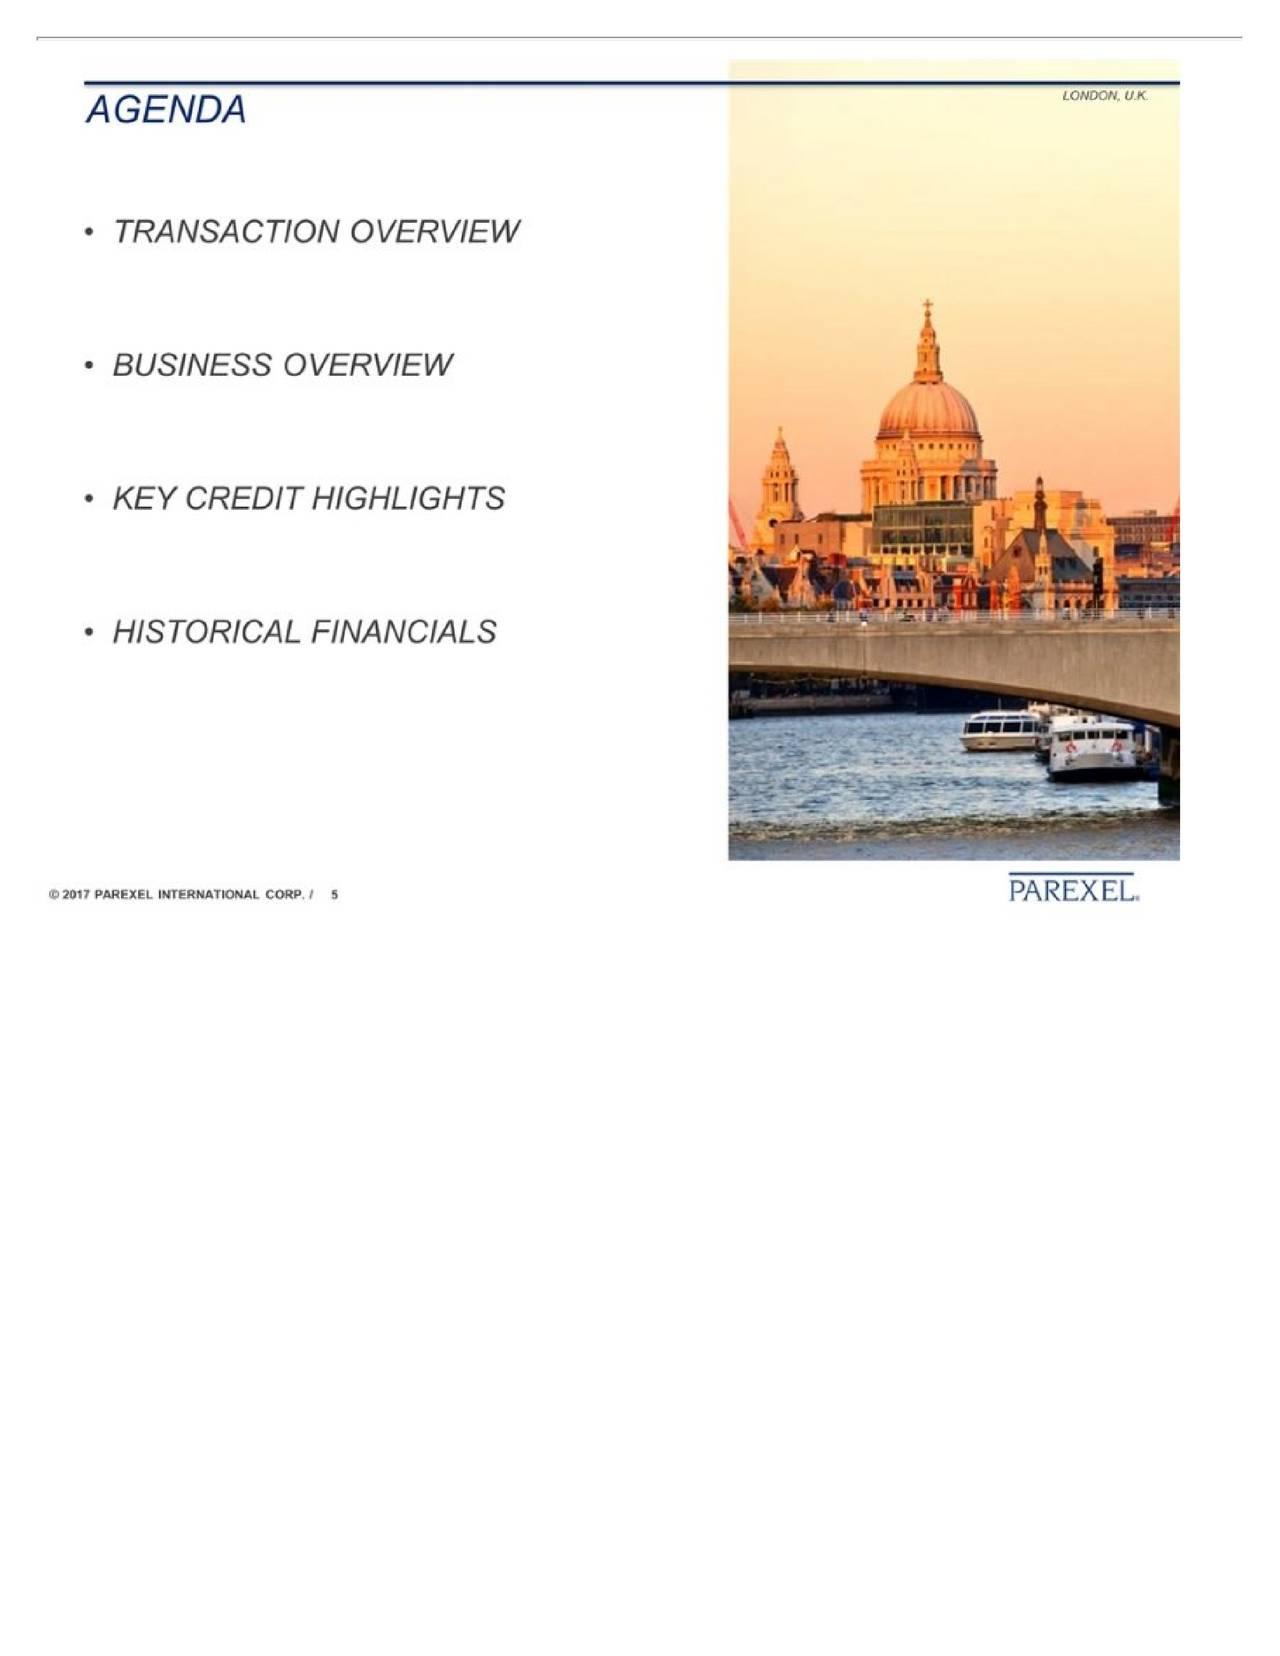 parexel international corporation  prxl  investor